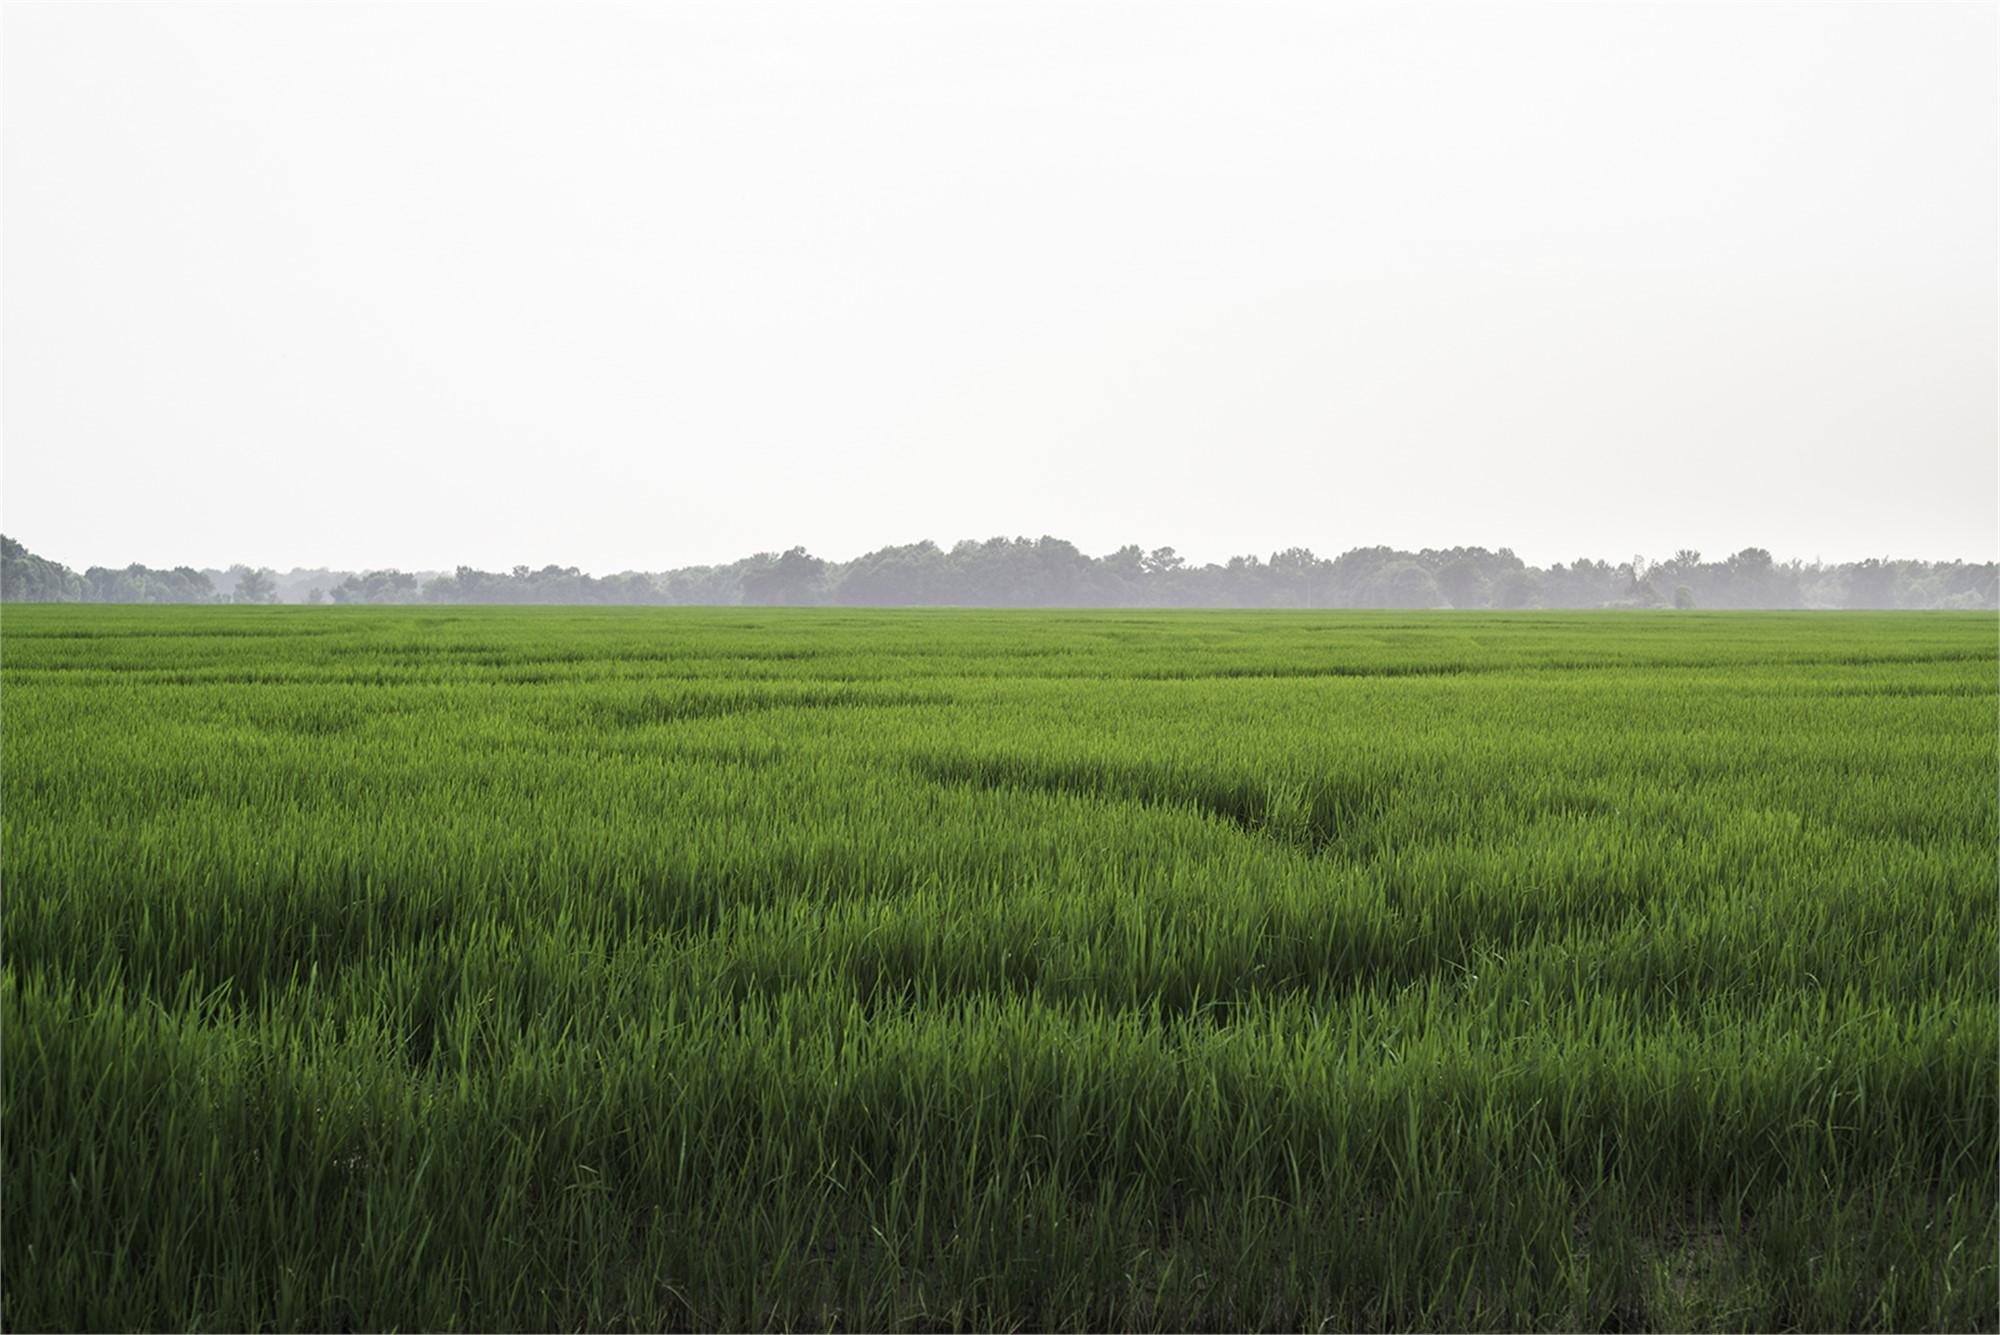 Arkansas Rice Field by Frank Sherwood White